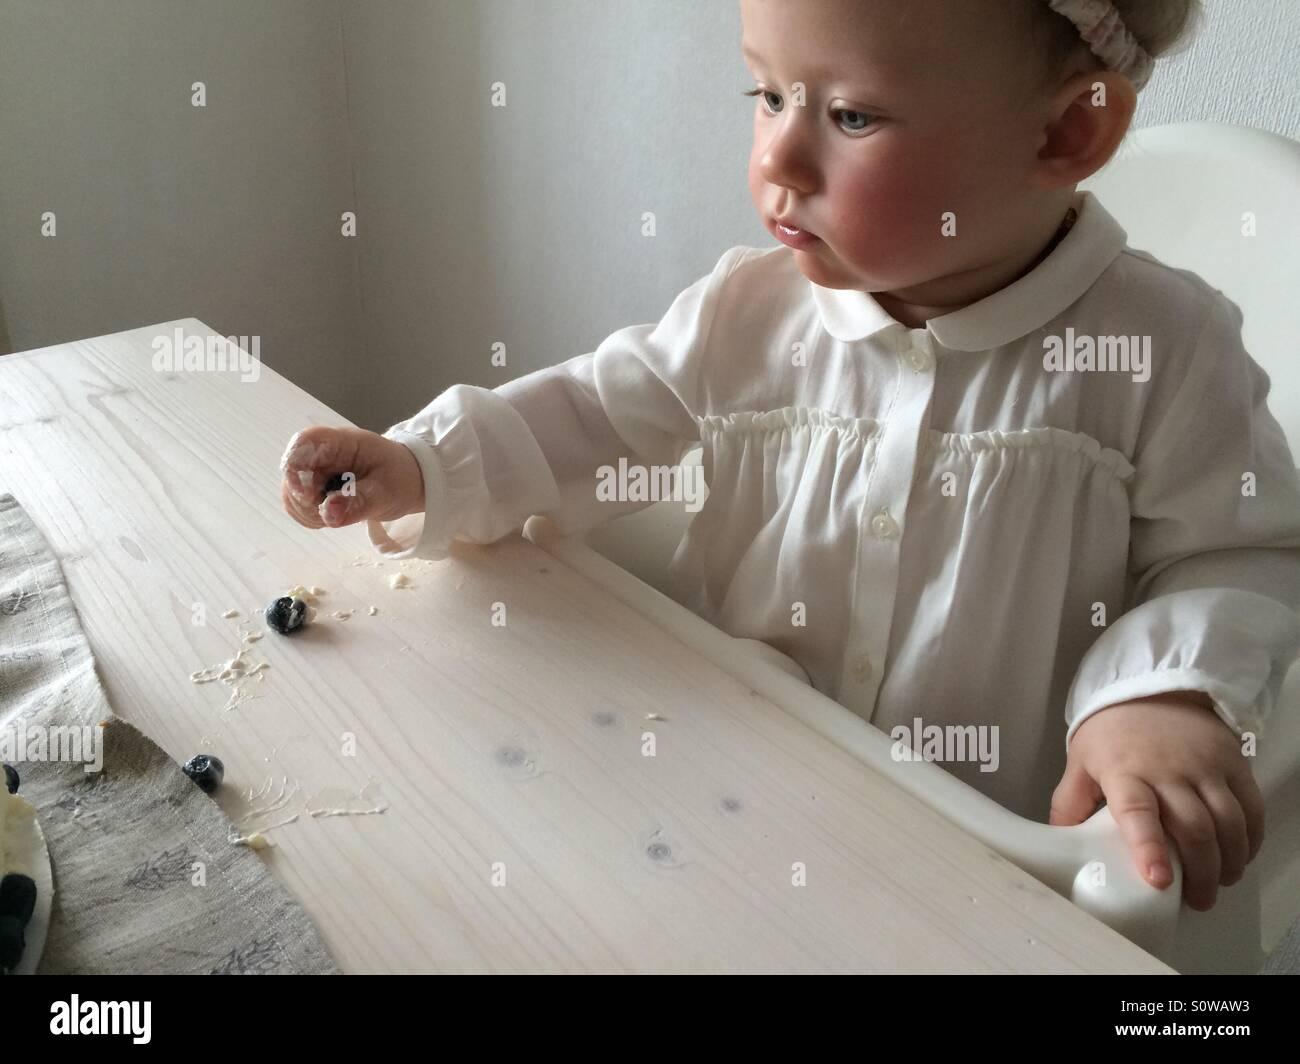 Primer cumpleaños del bebé Imagen De Stock